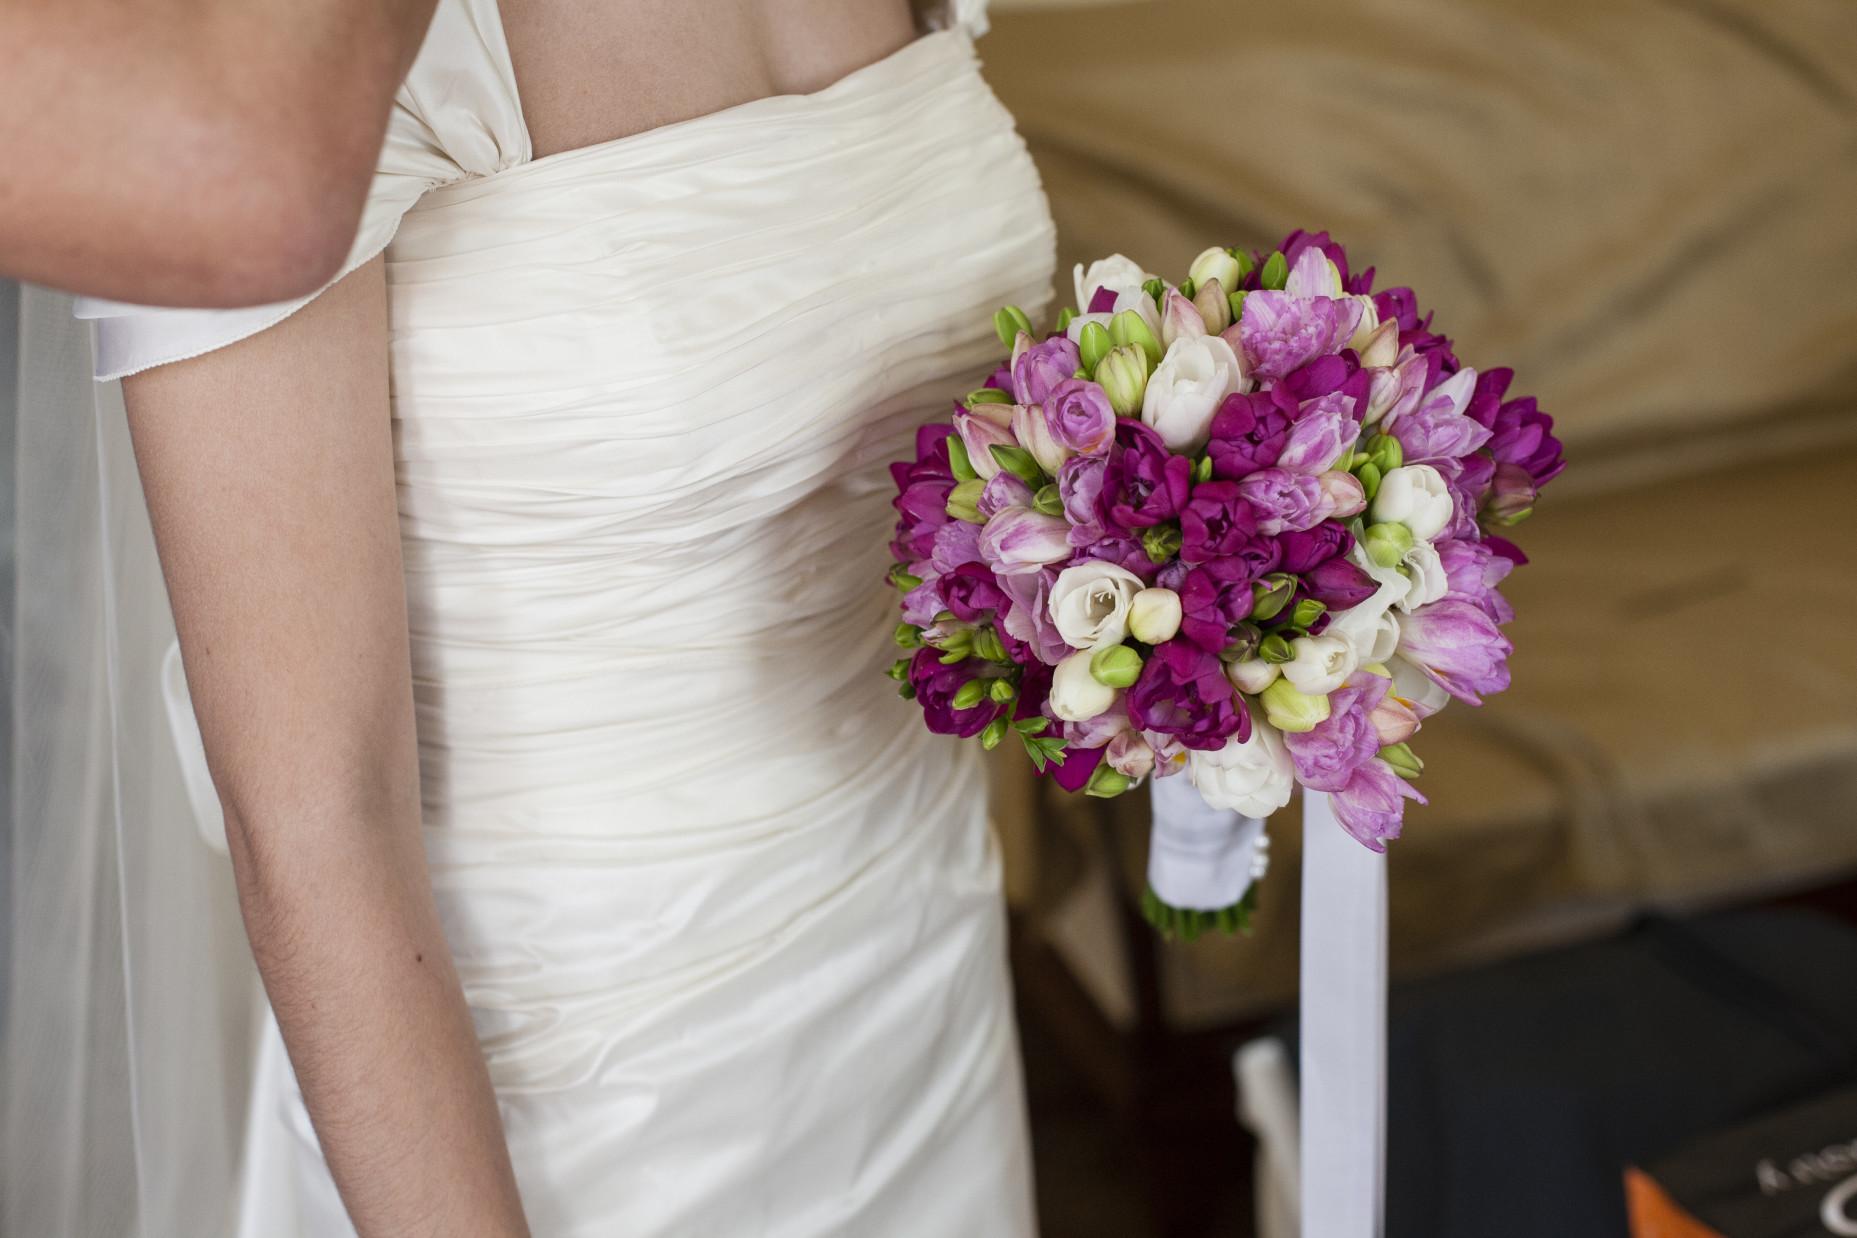 Bouquet Sposa Luglio.Bouquet Sposa Luglio Ikbeneenipad